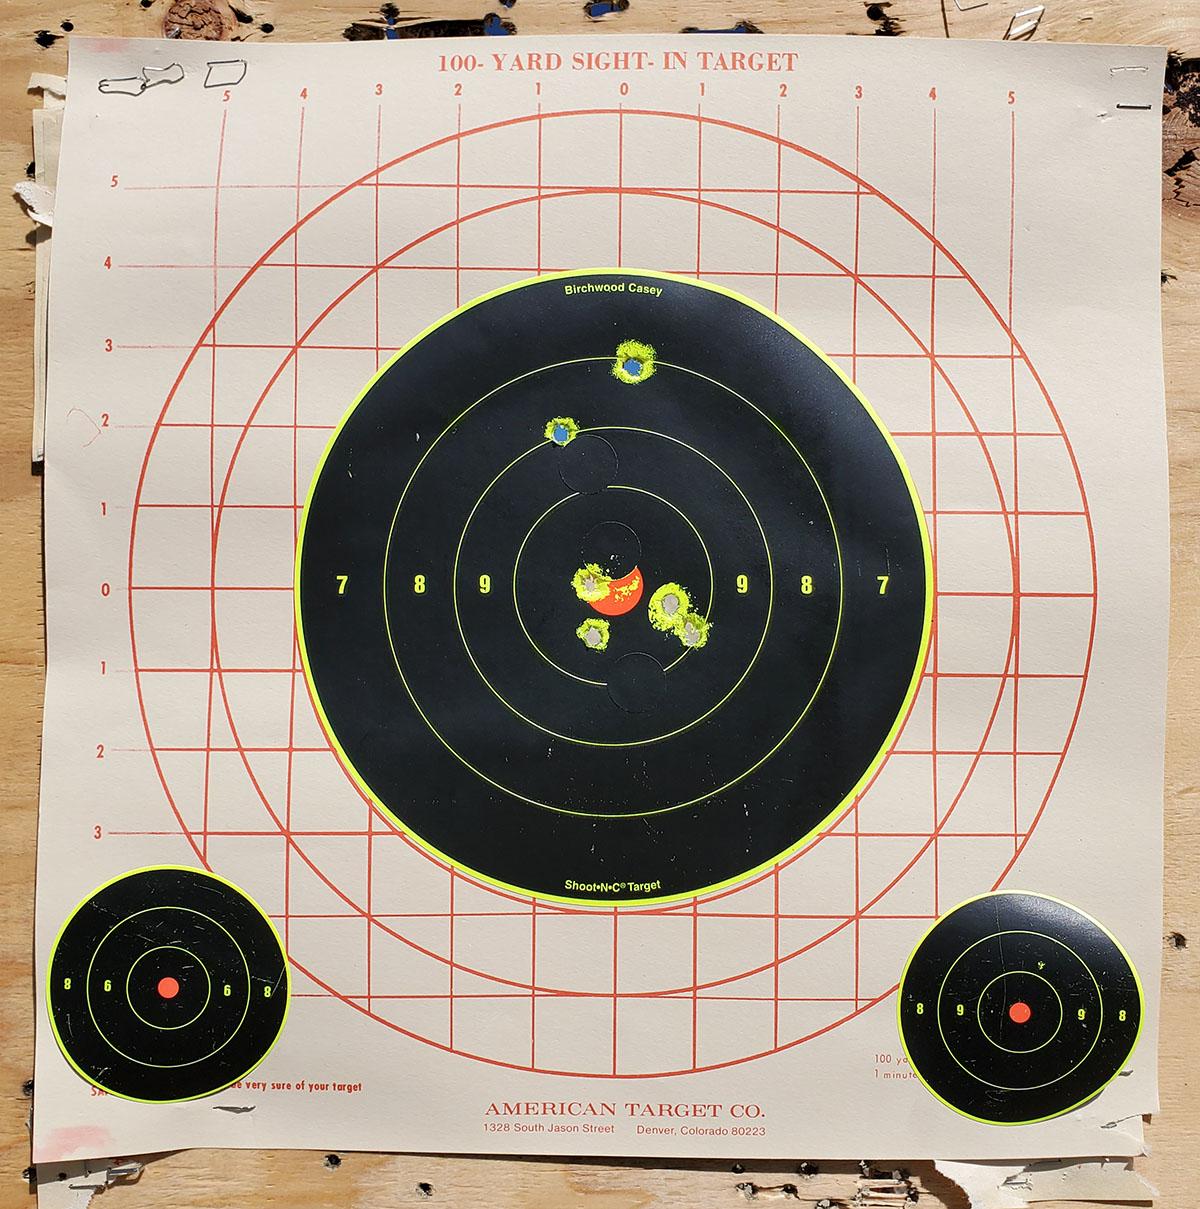 Bullet holes in a target